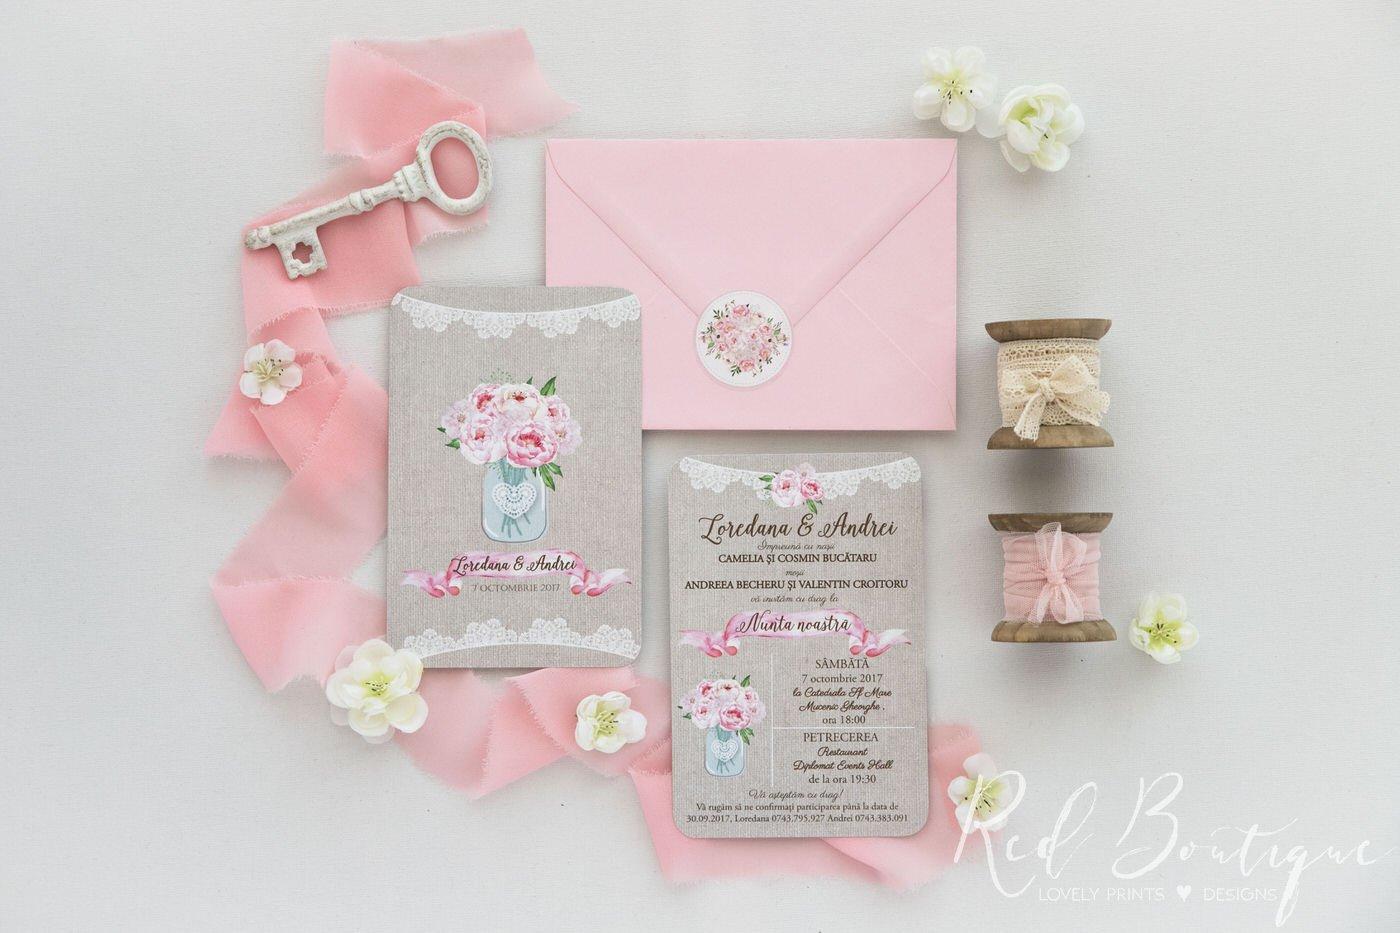 invitatie de nunta rustica cu buchet de bujori roz in borcan